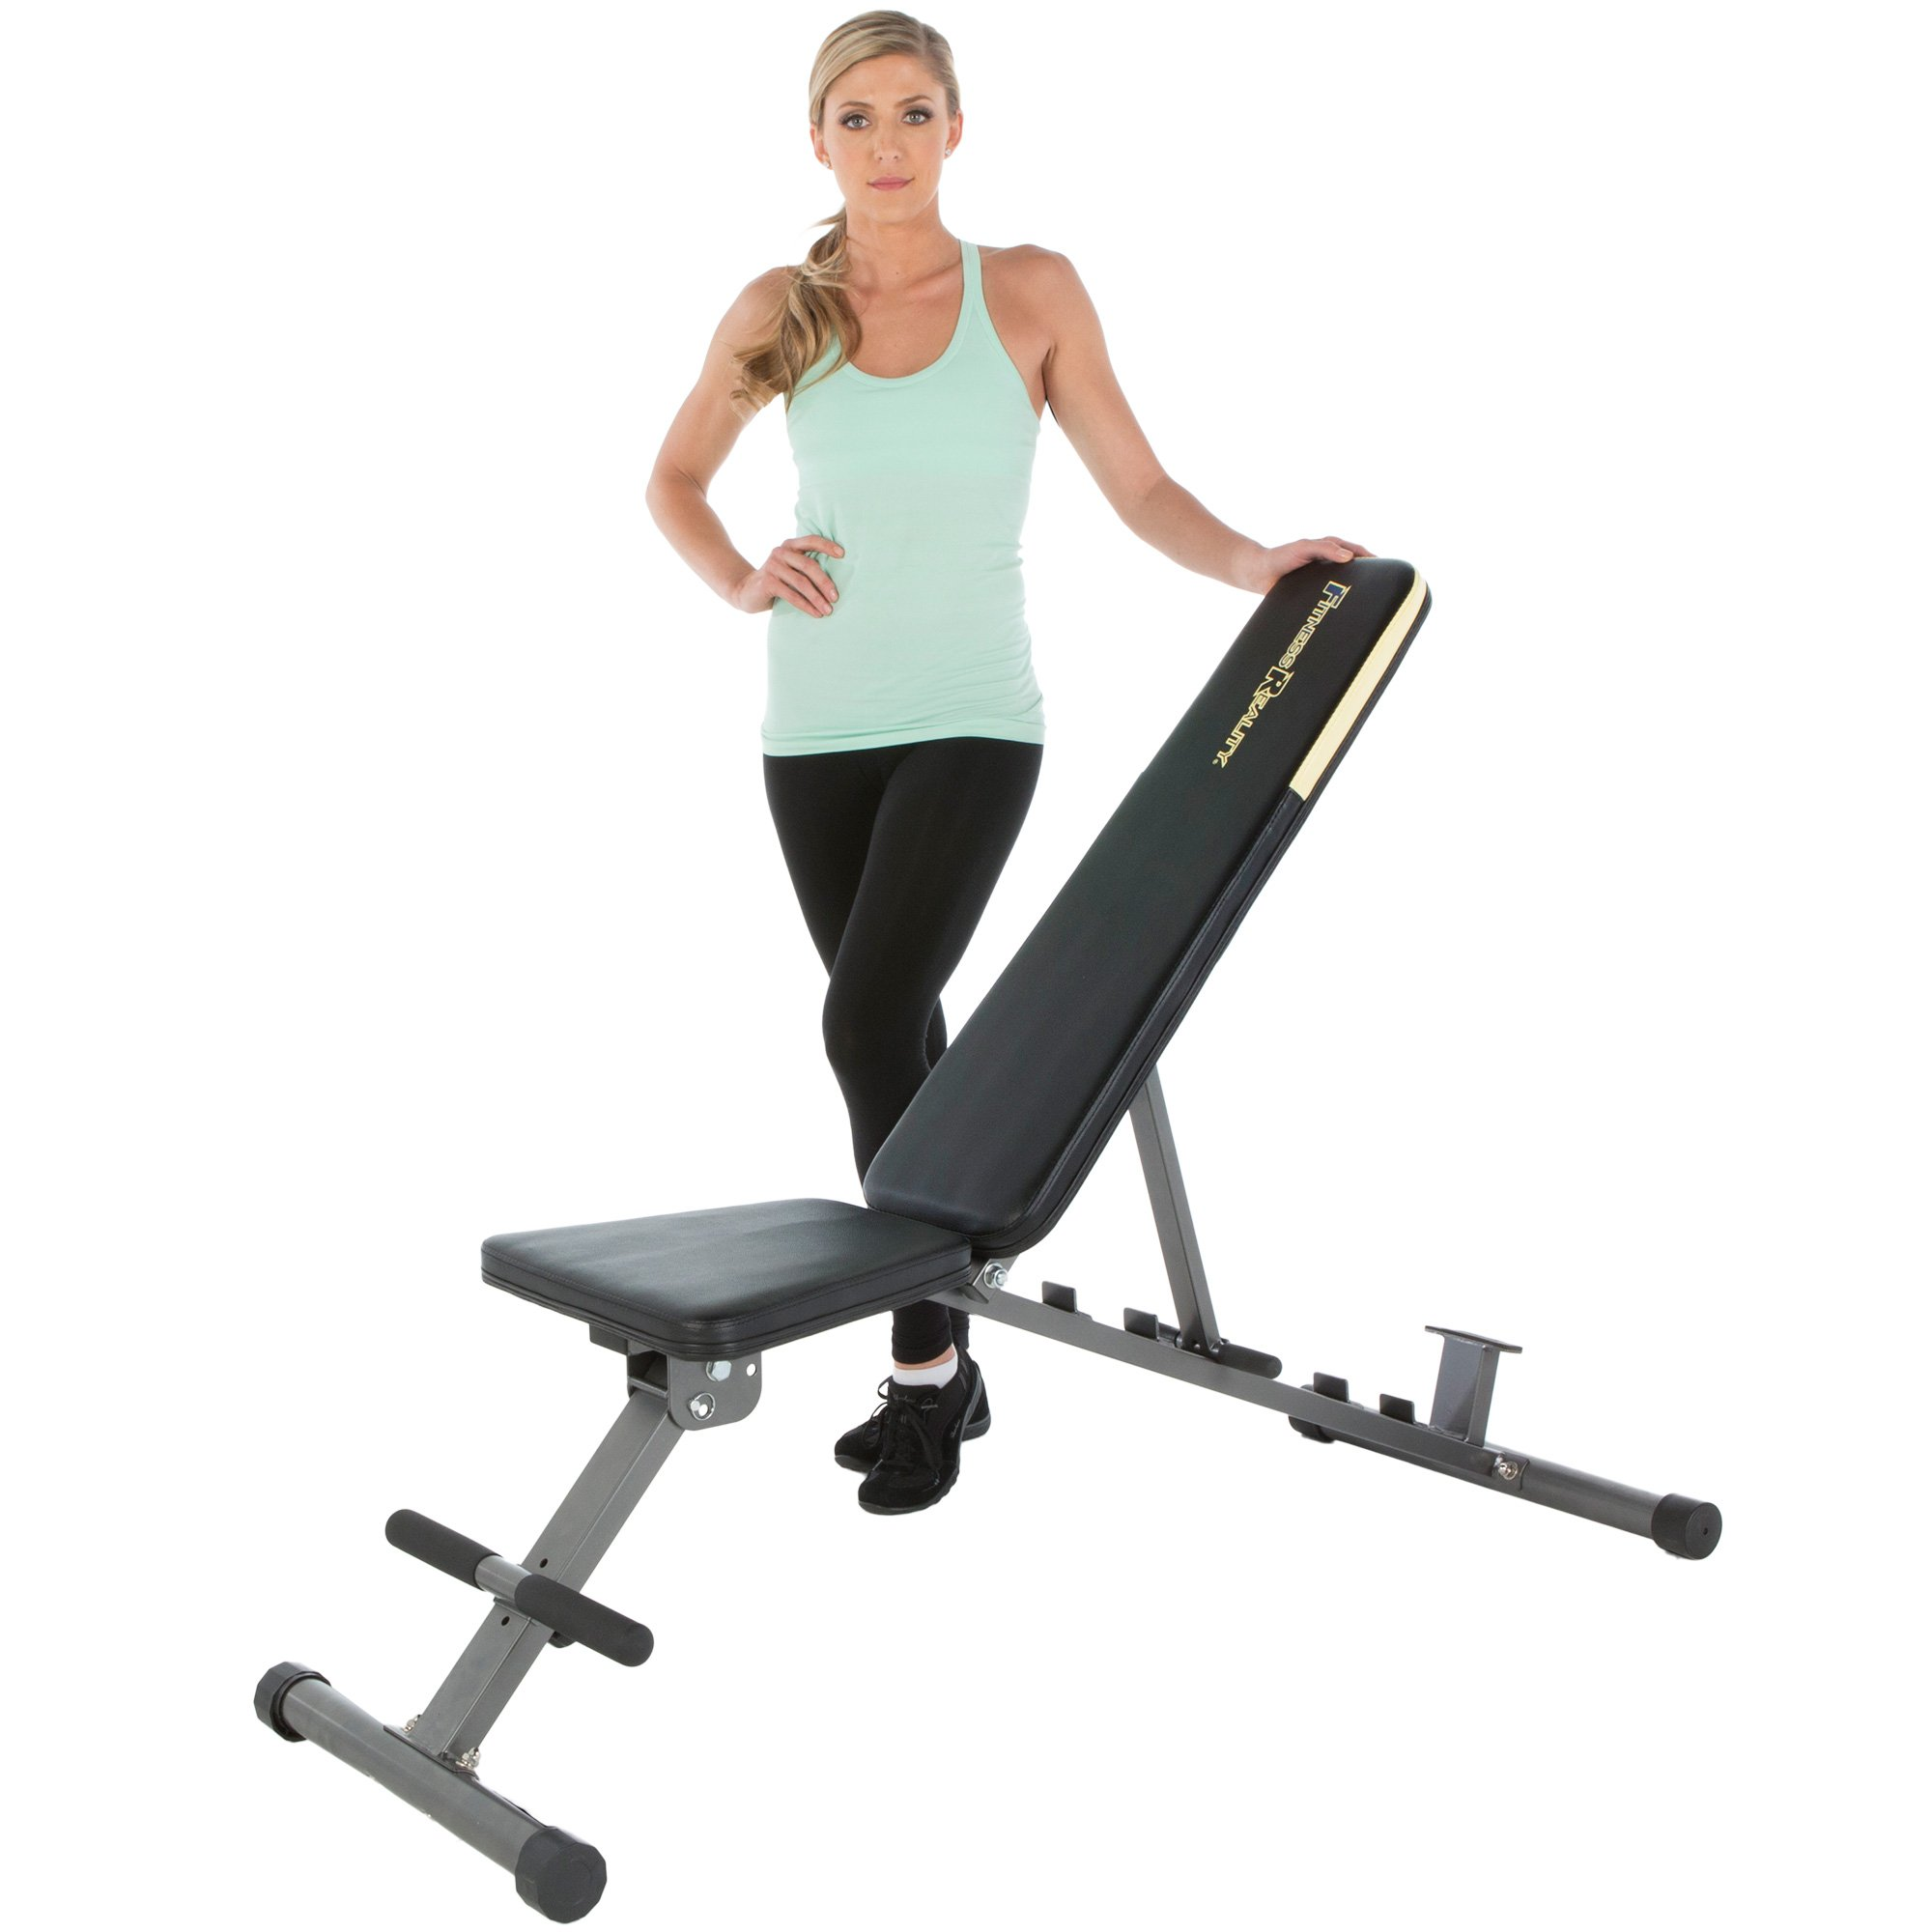 weight simple com bench marcy diamond elite webdesigninusa sports tittle authority